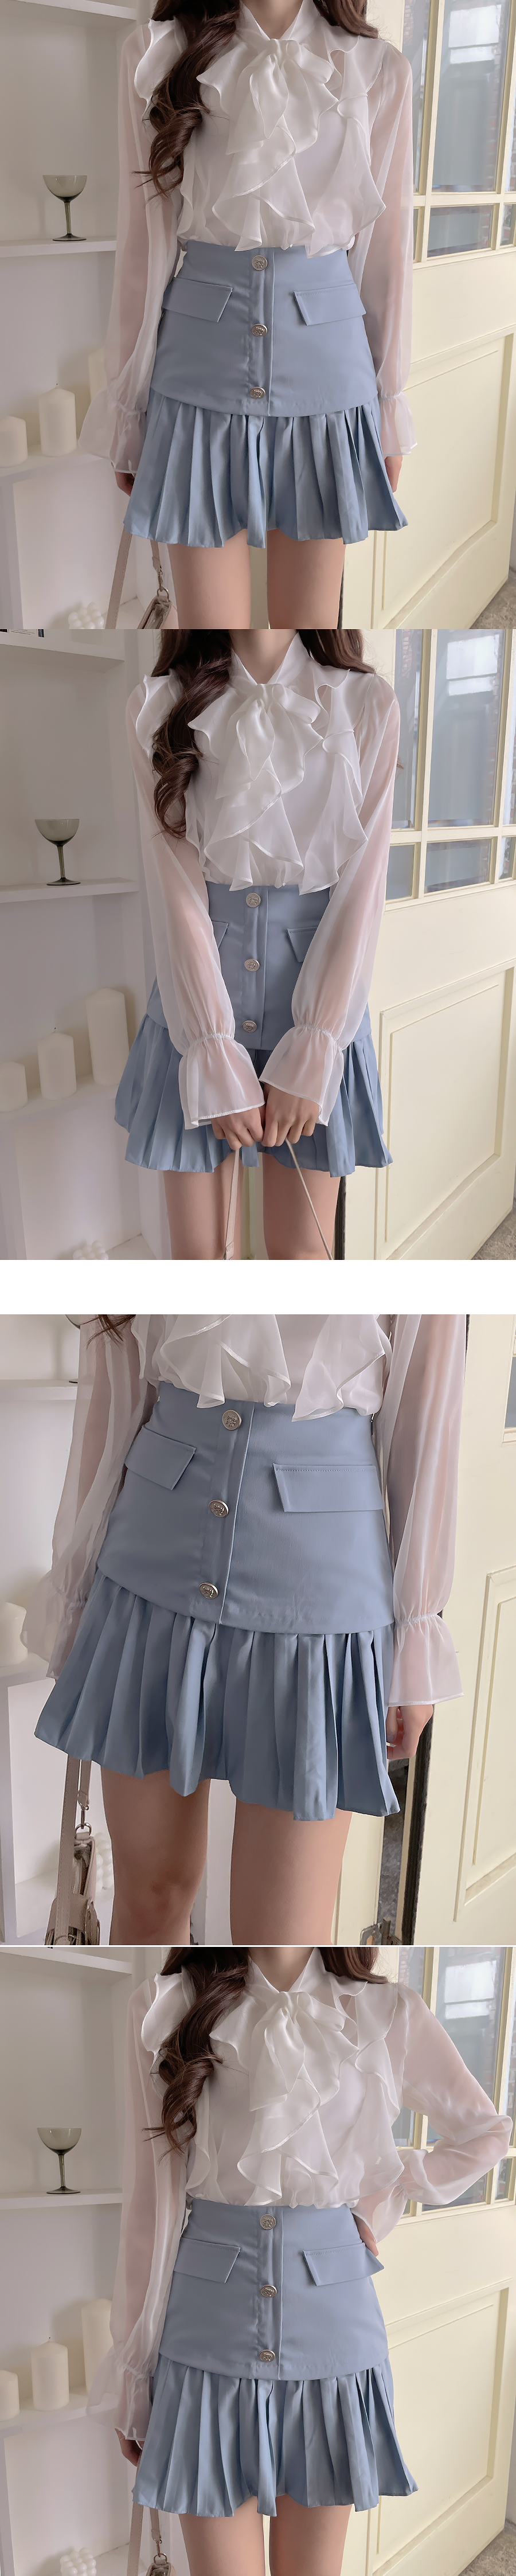 Ribe see-through chiffon frill blouse 3color